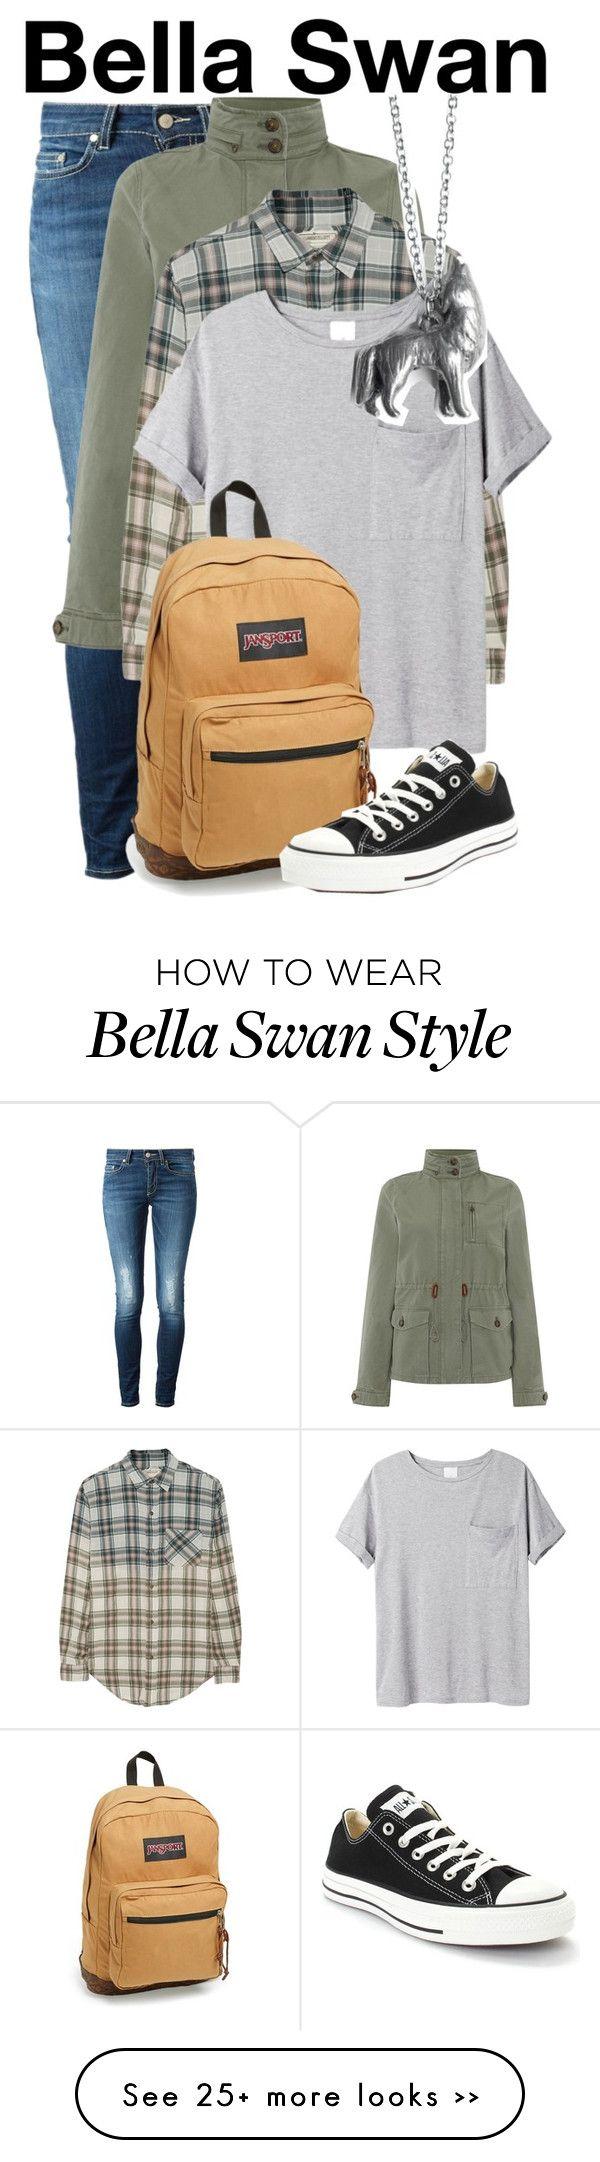 """Bella Swan ~Wendy Darling"" by the-fandom-gals on Polyvore"